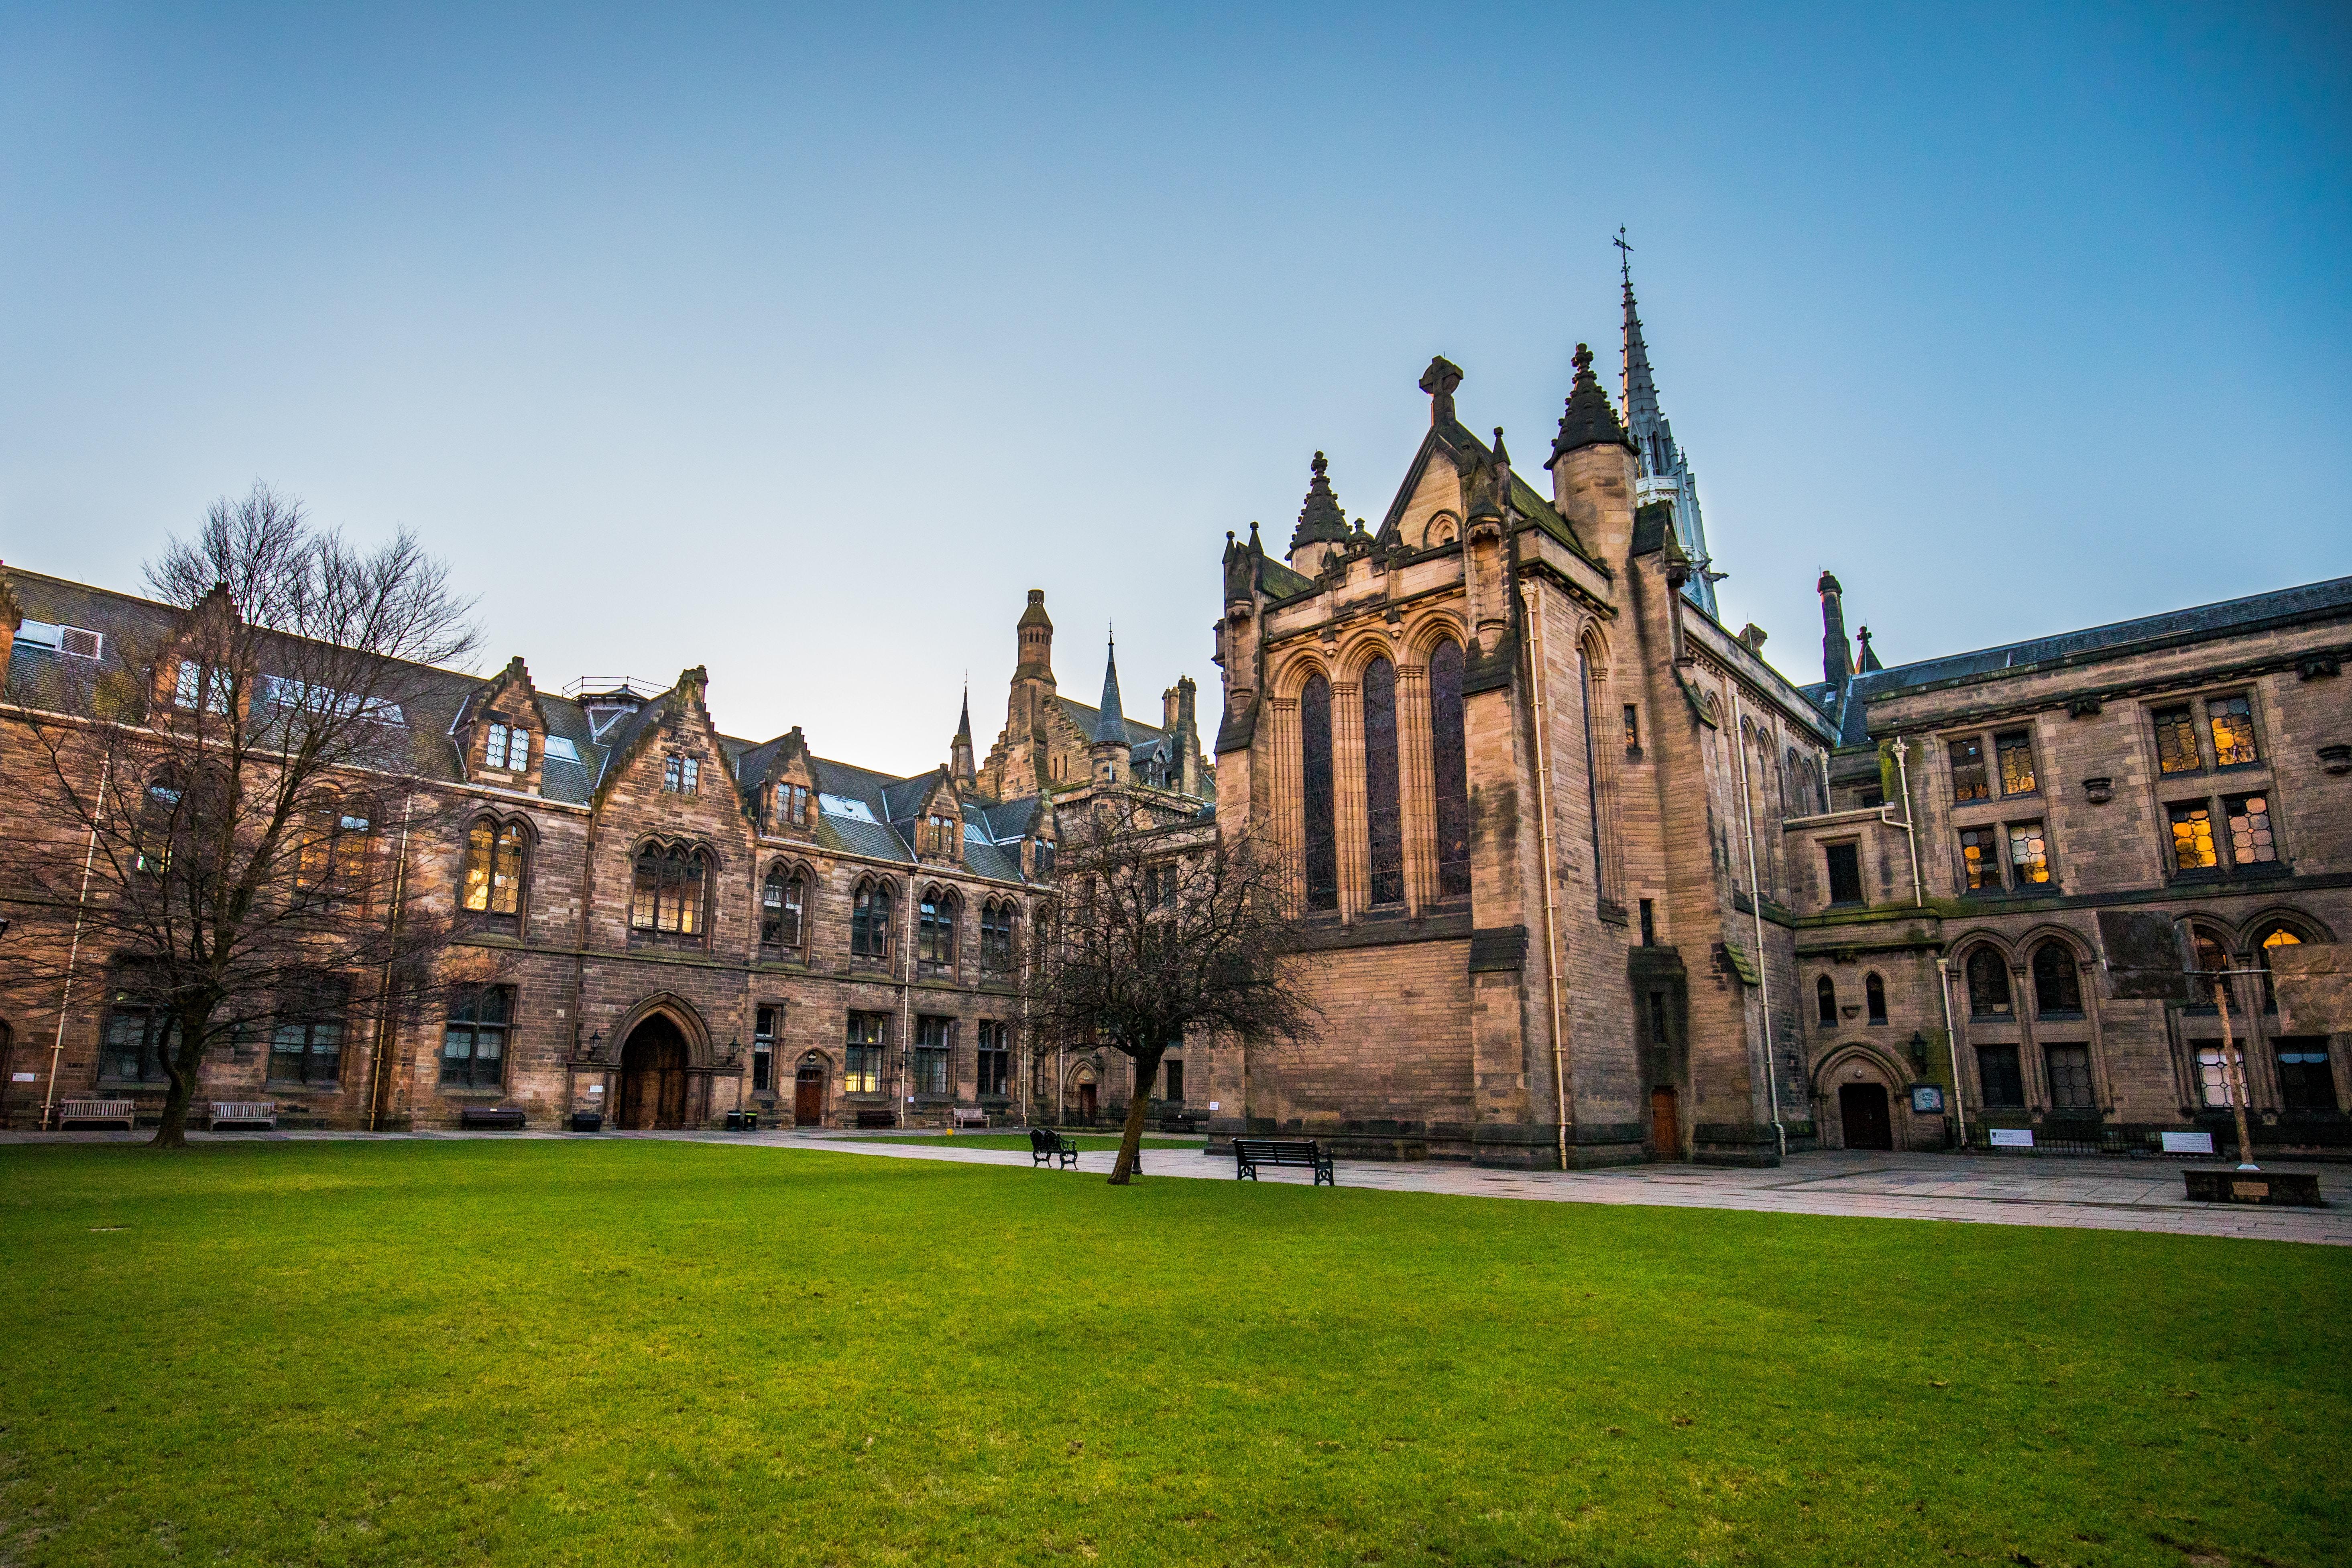 A photo of a university